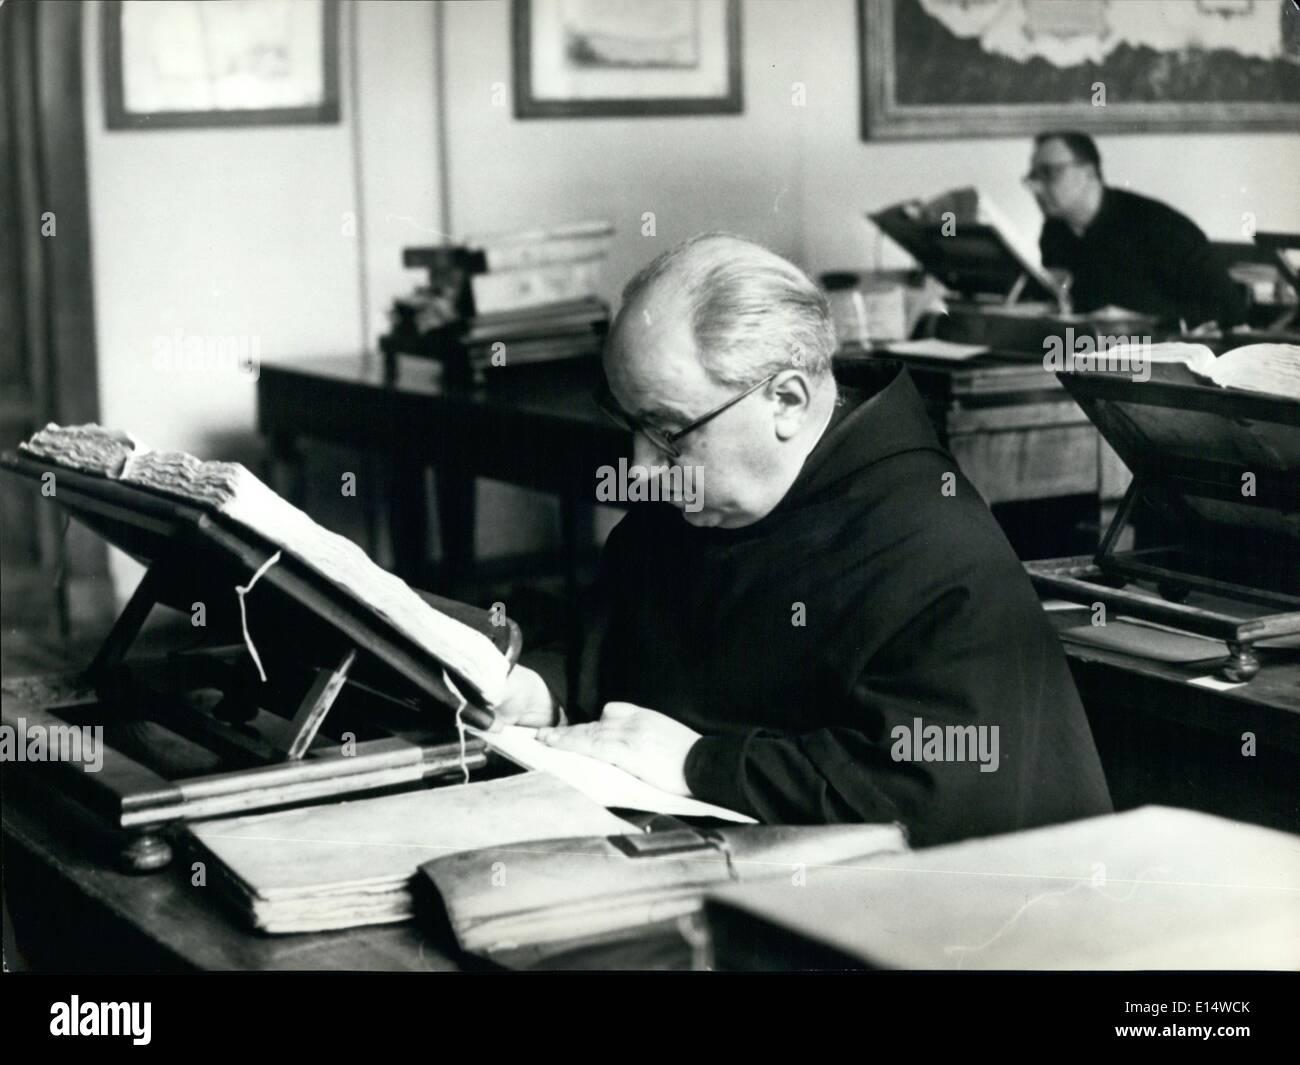 18. April 2012 - Lesesaal des Vatikanischen geheim-Archivs. Stockbild